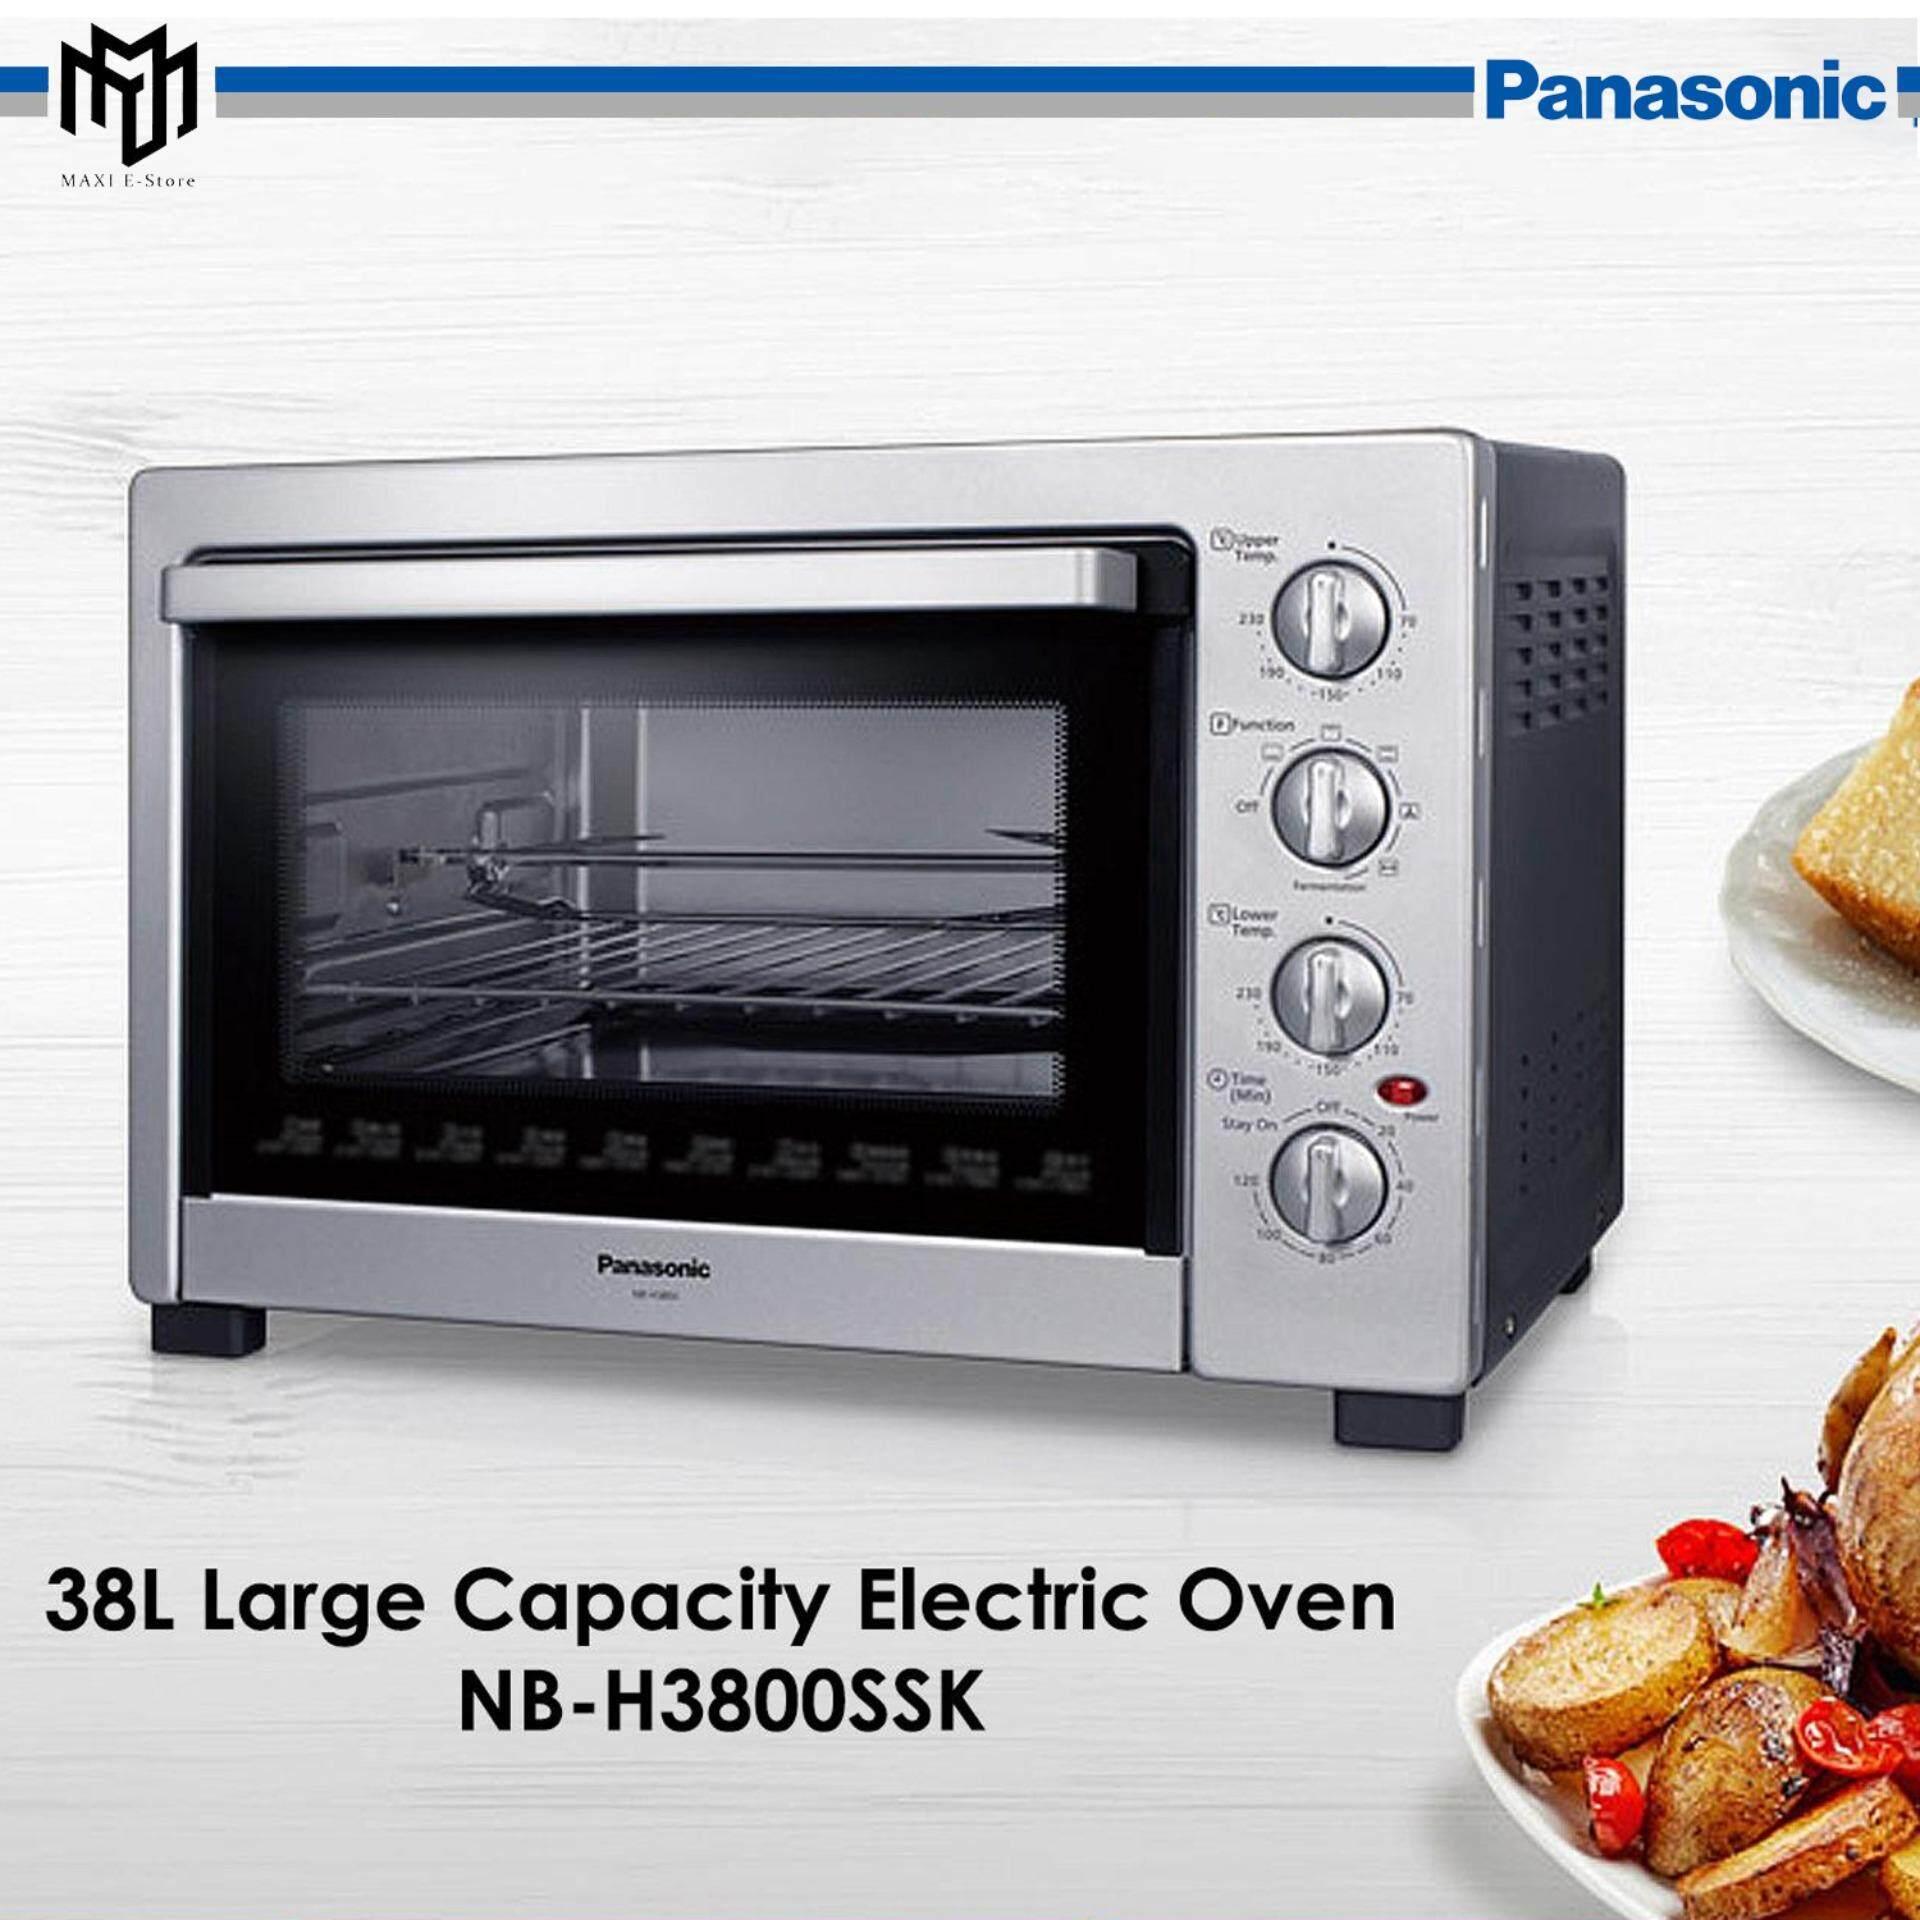 Panasonic NB-H3800 Electric Oven 38L 1800W